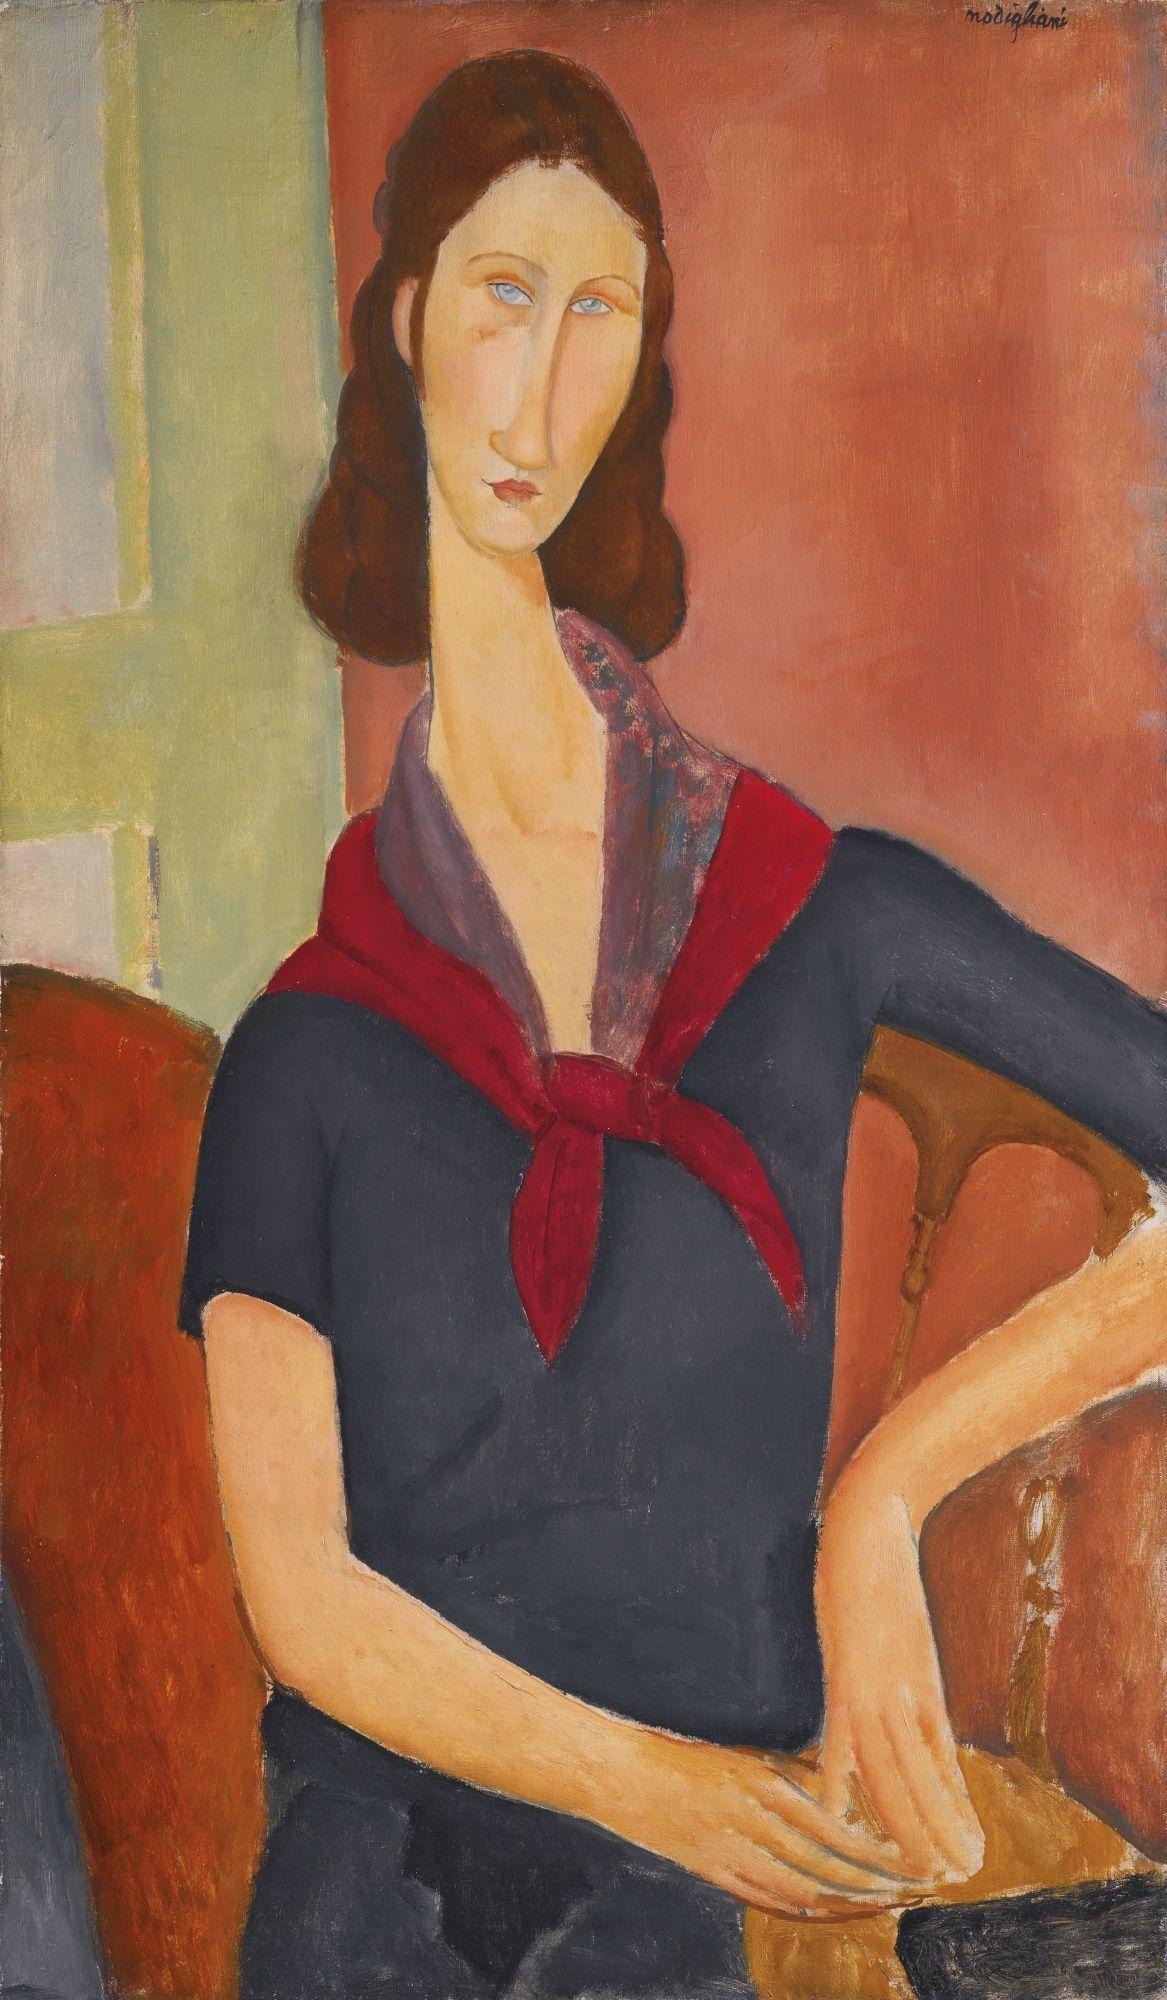 Amedeo Modigliani, 'Portrait of Jeanne Hébuterne with a Scarf', 1919